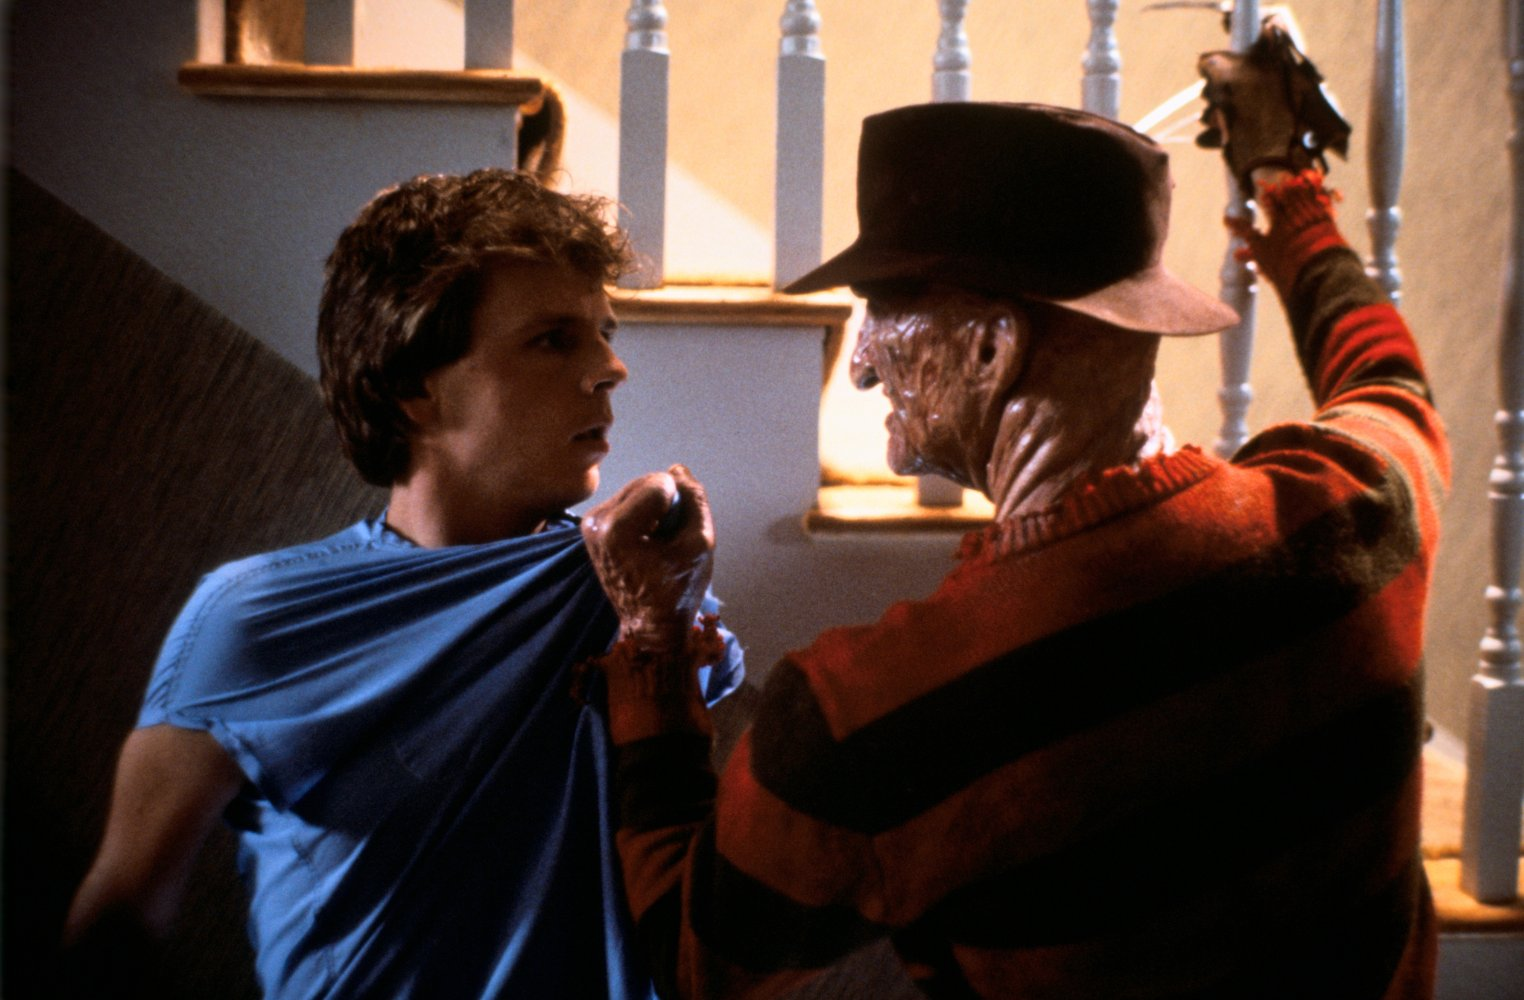 Jesse Walsh (Mark Patton) and Freddy Krueger (Robert Englund) in A Nightmare on Elm Street Part II :Freddy's Revenge (1985)